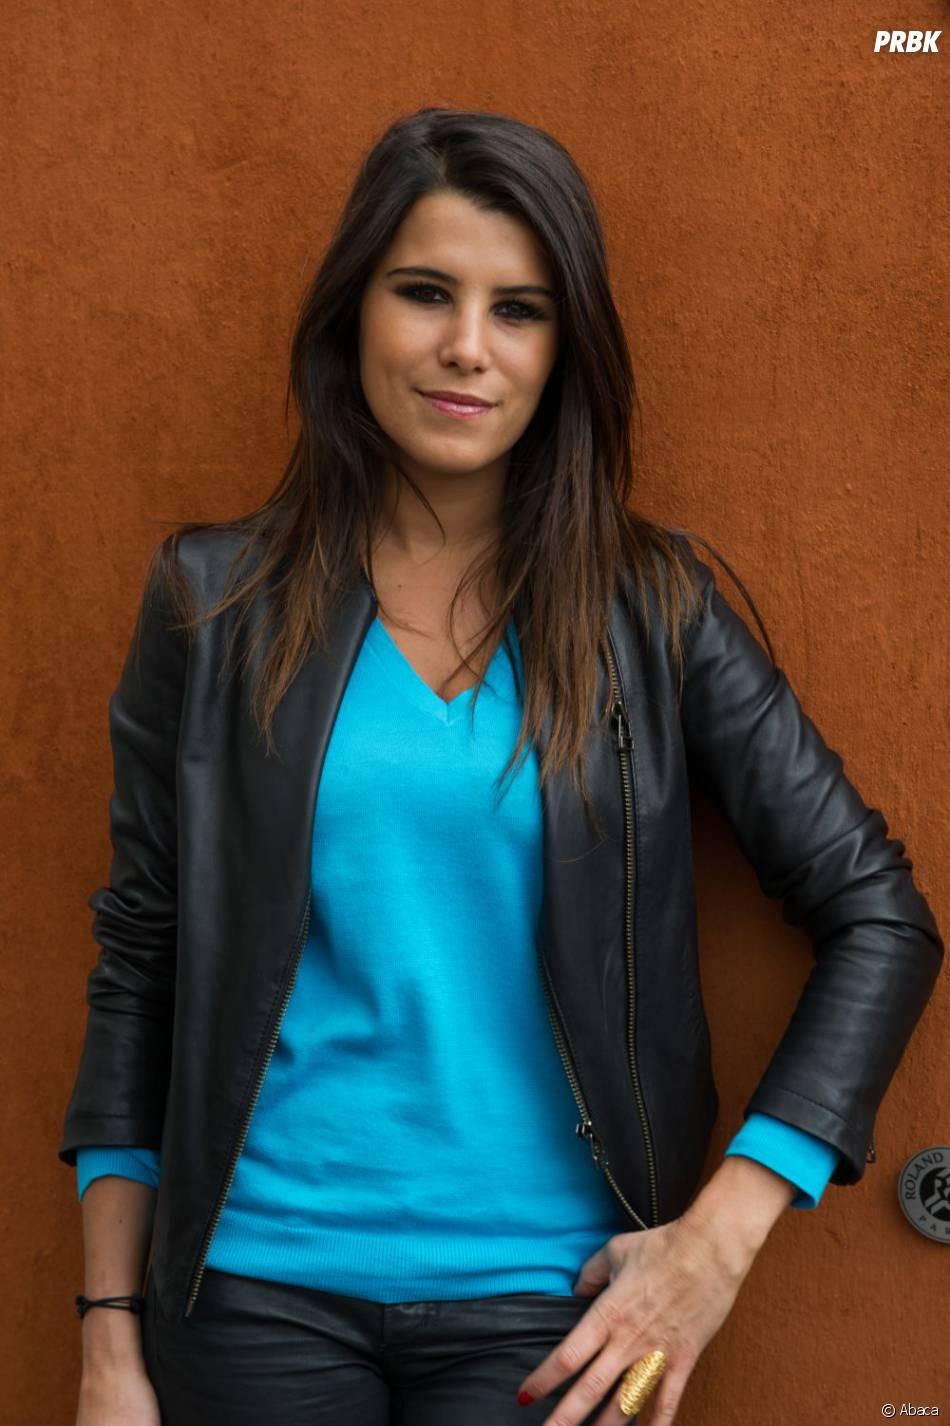 Karine Ferri à Roland Garros 2013